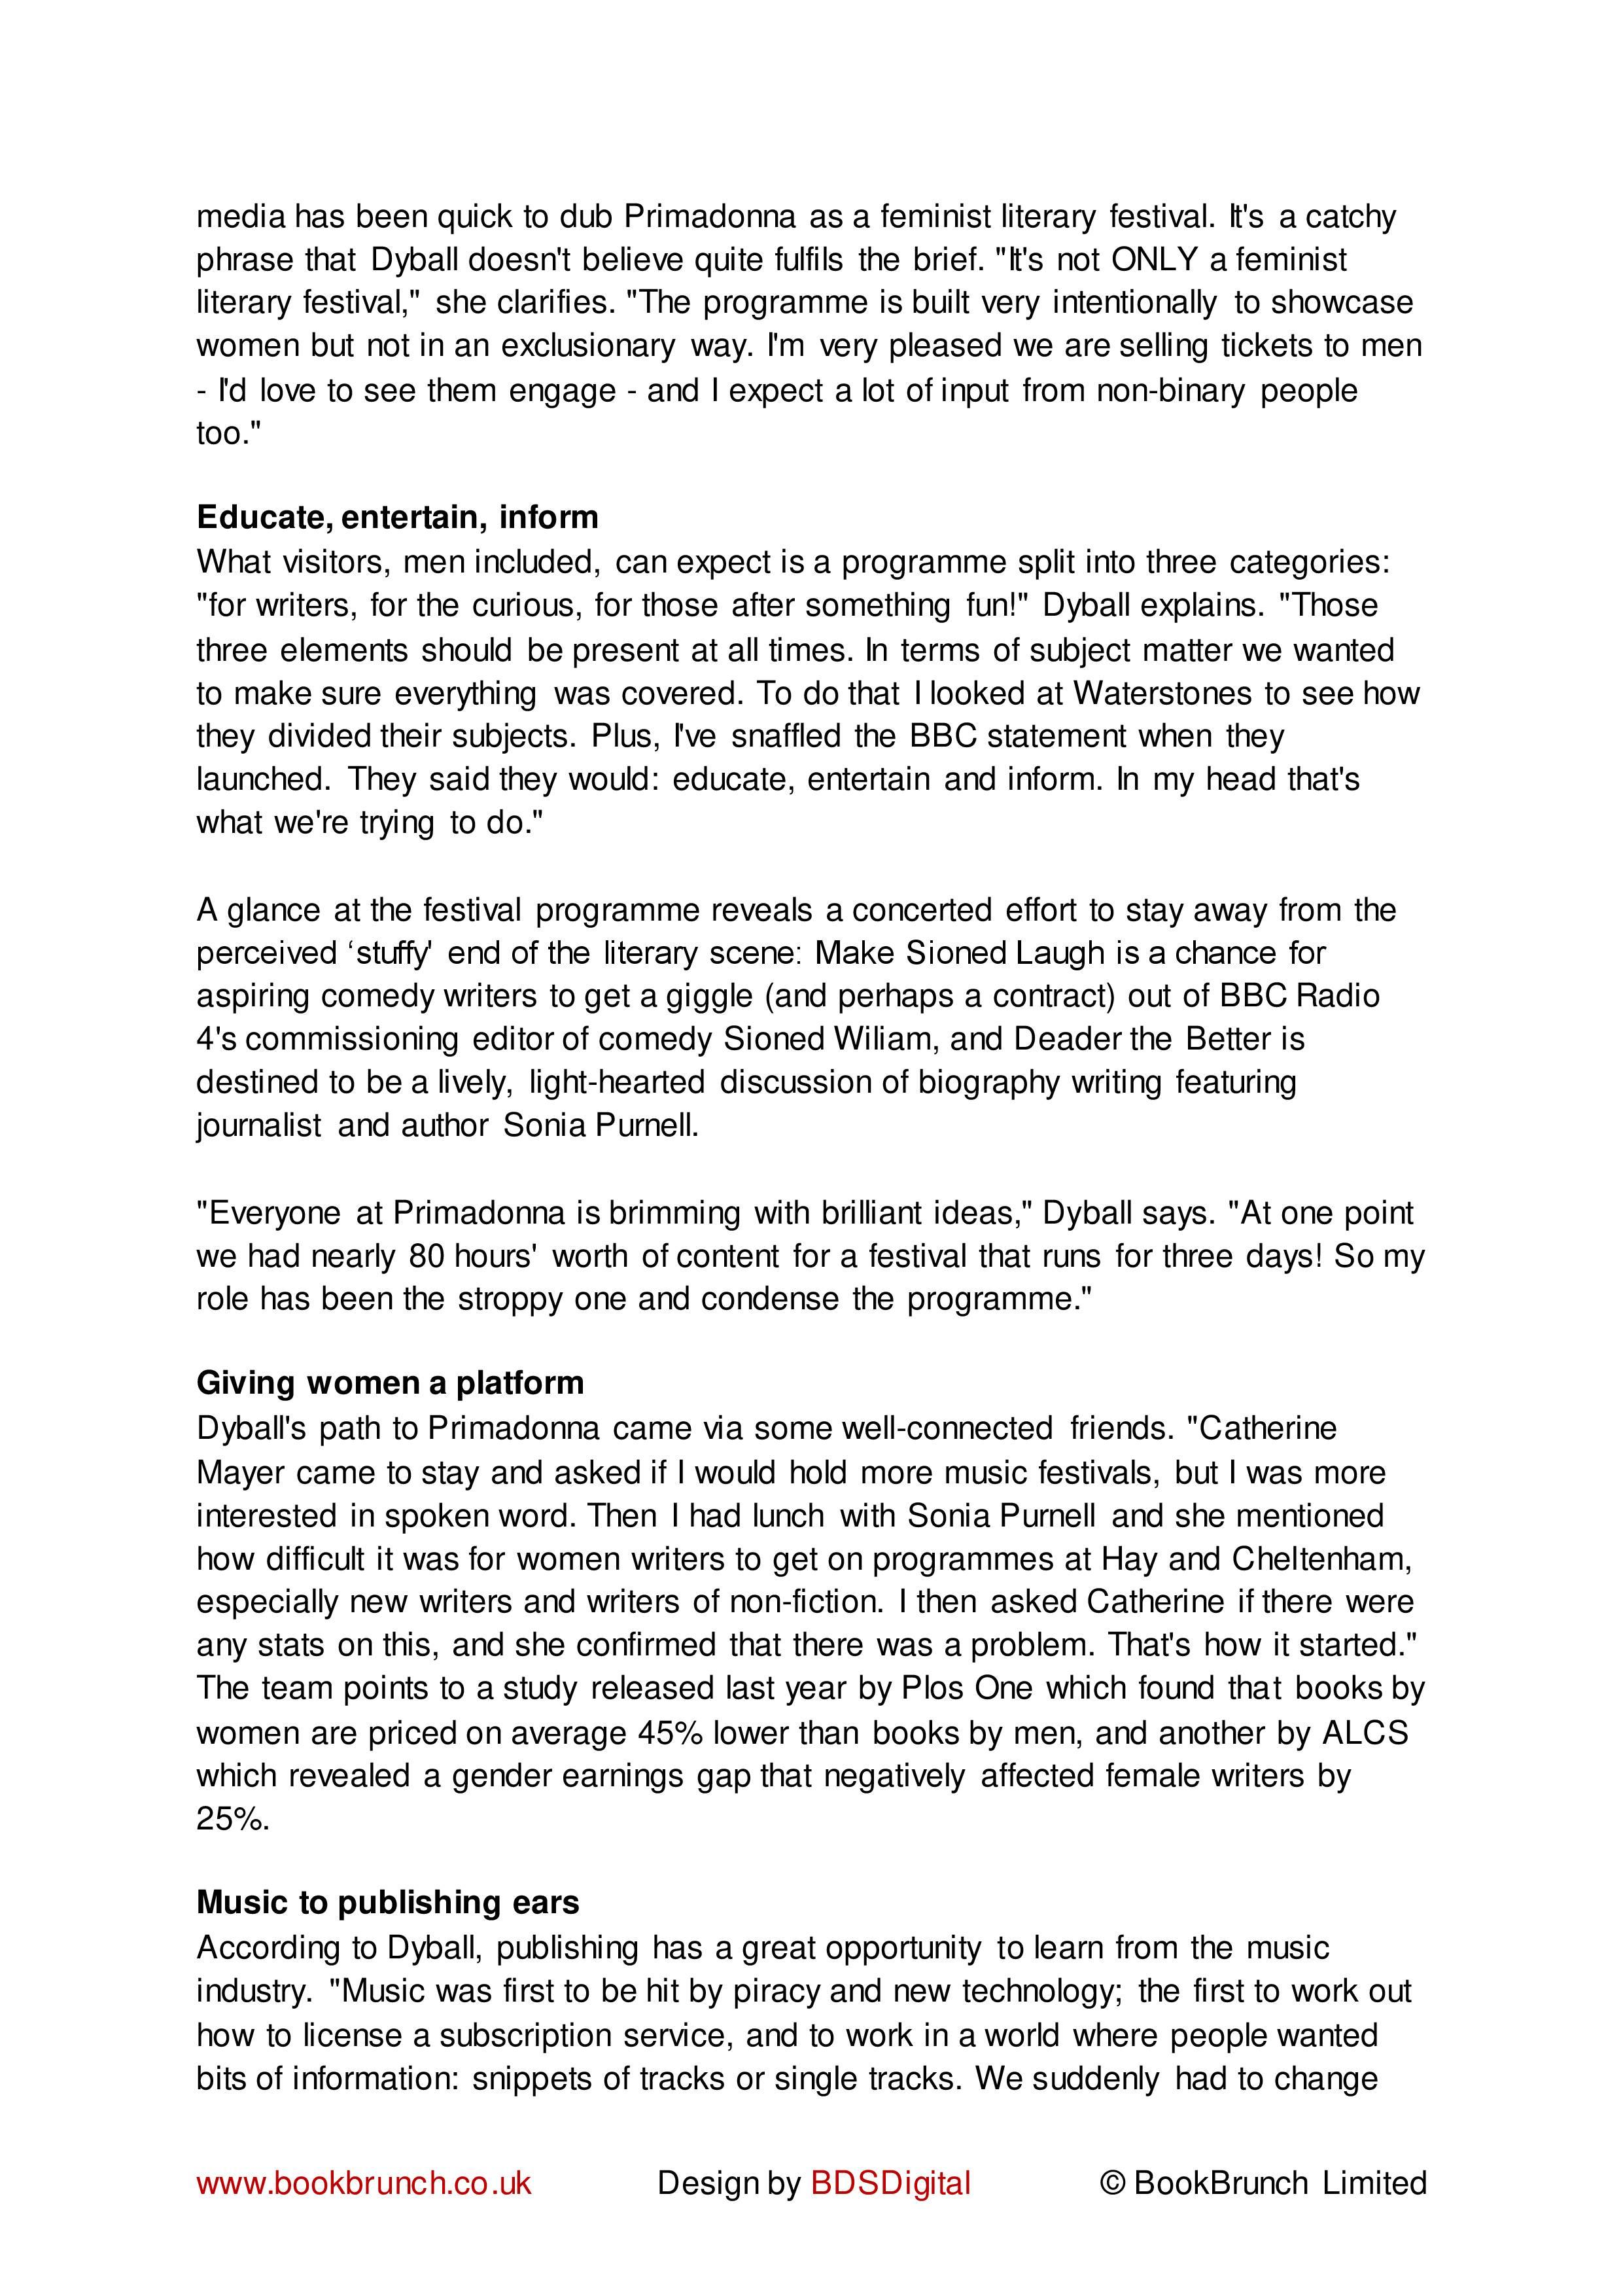 BookBrunch PDF Export - The BookBrunch Interview_ Jane Dyball, Primadonna co-founder (1)-2.jpg